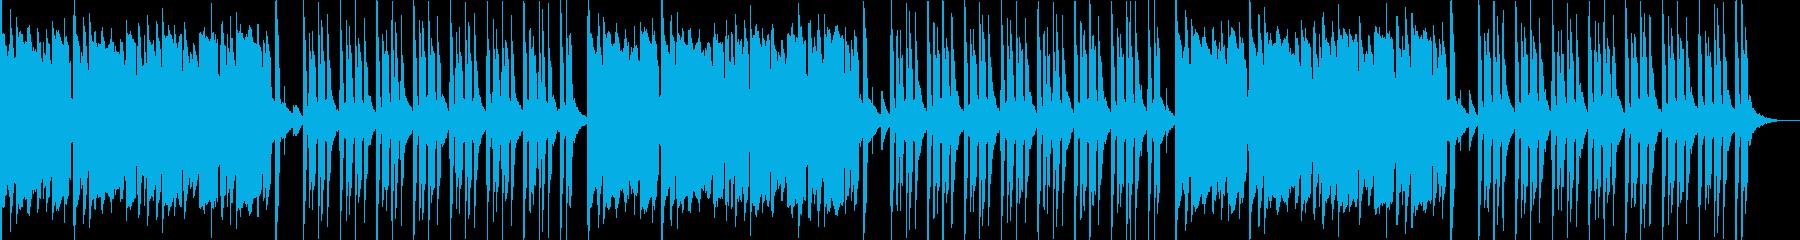 TikTokおとぼけ動画に可愛いアンデスの再生済みの波形